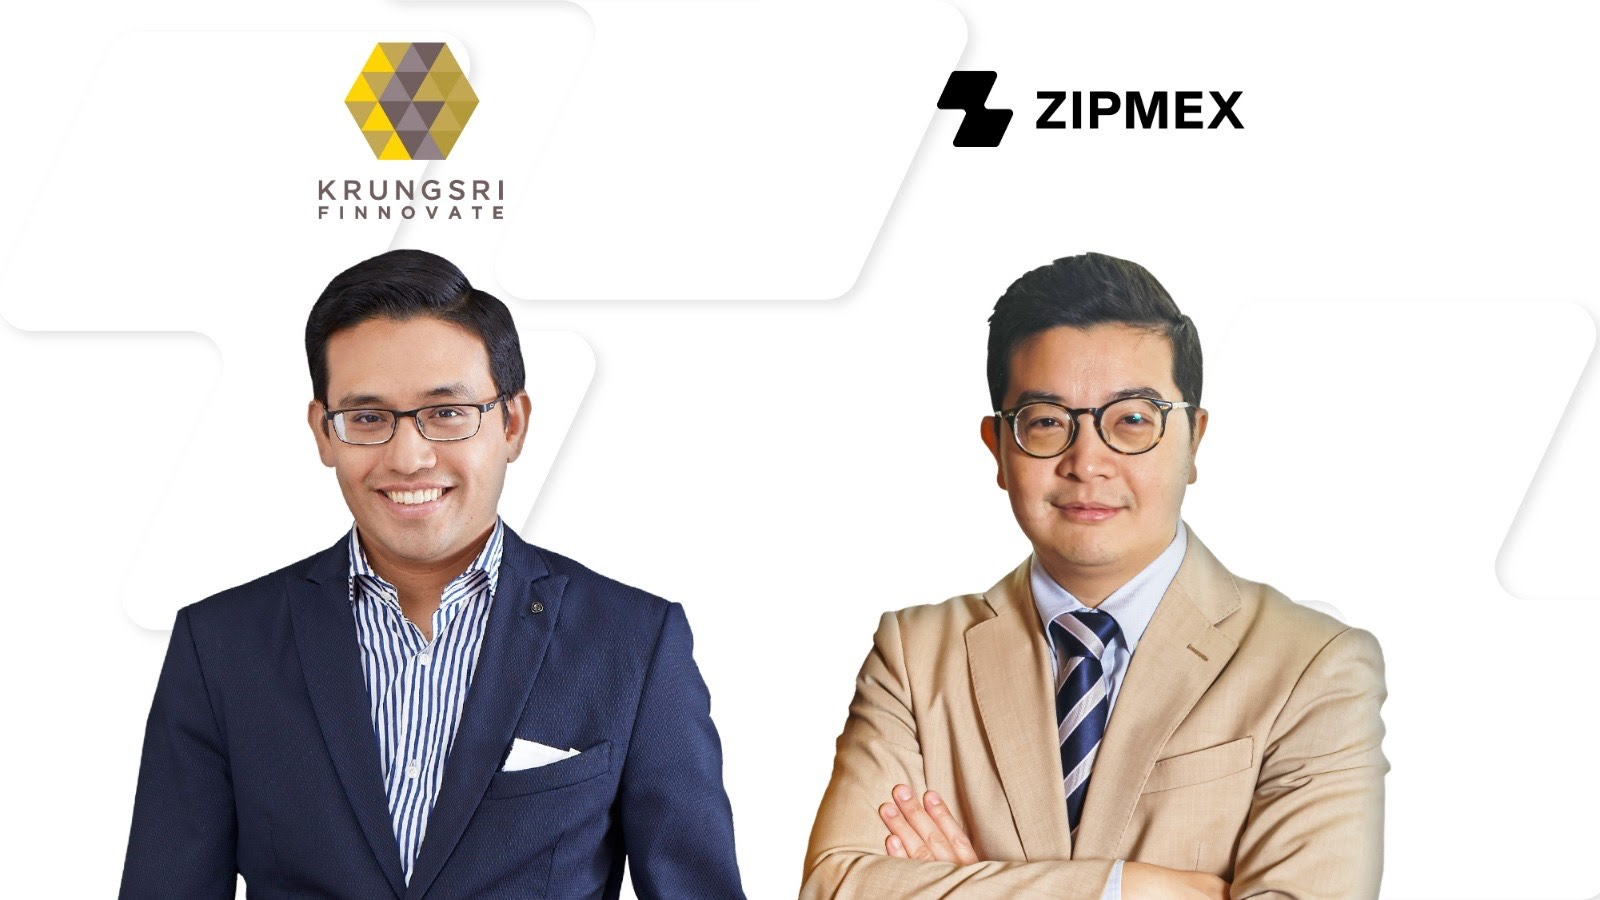 Zipmex ประกาศการระดมทุน Series B จากกรุงศรี ฟินโนเวต